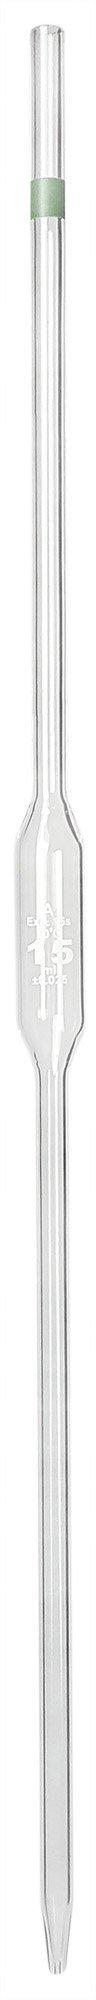 GSC International PPVL-15 Volumetric Pipette 15 mL Capacity, Borosilicate Glass